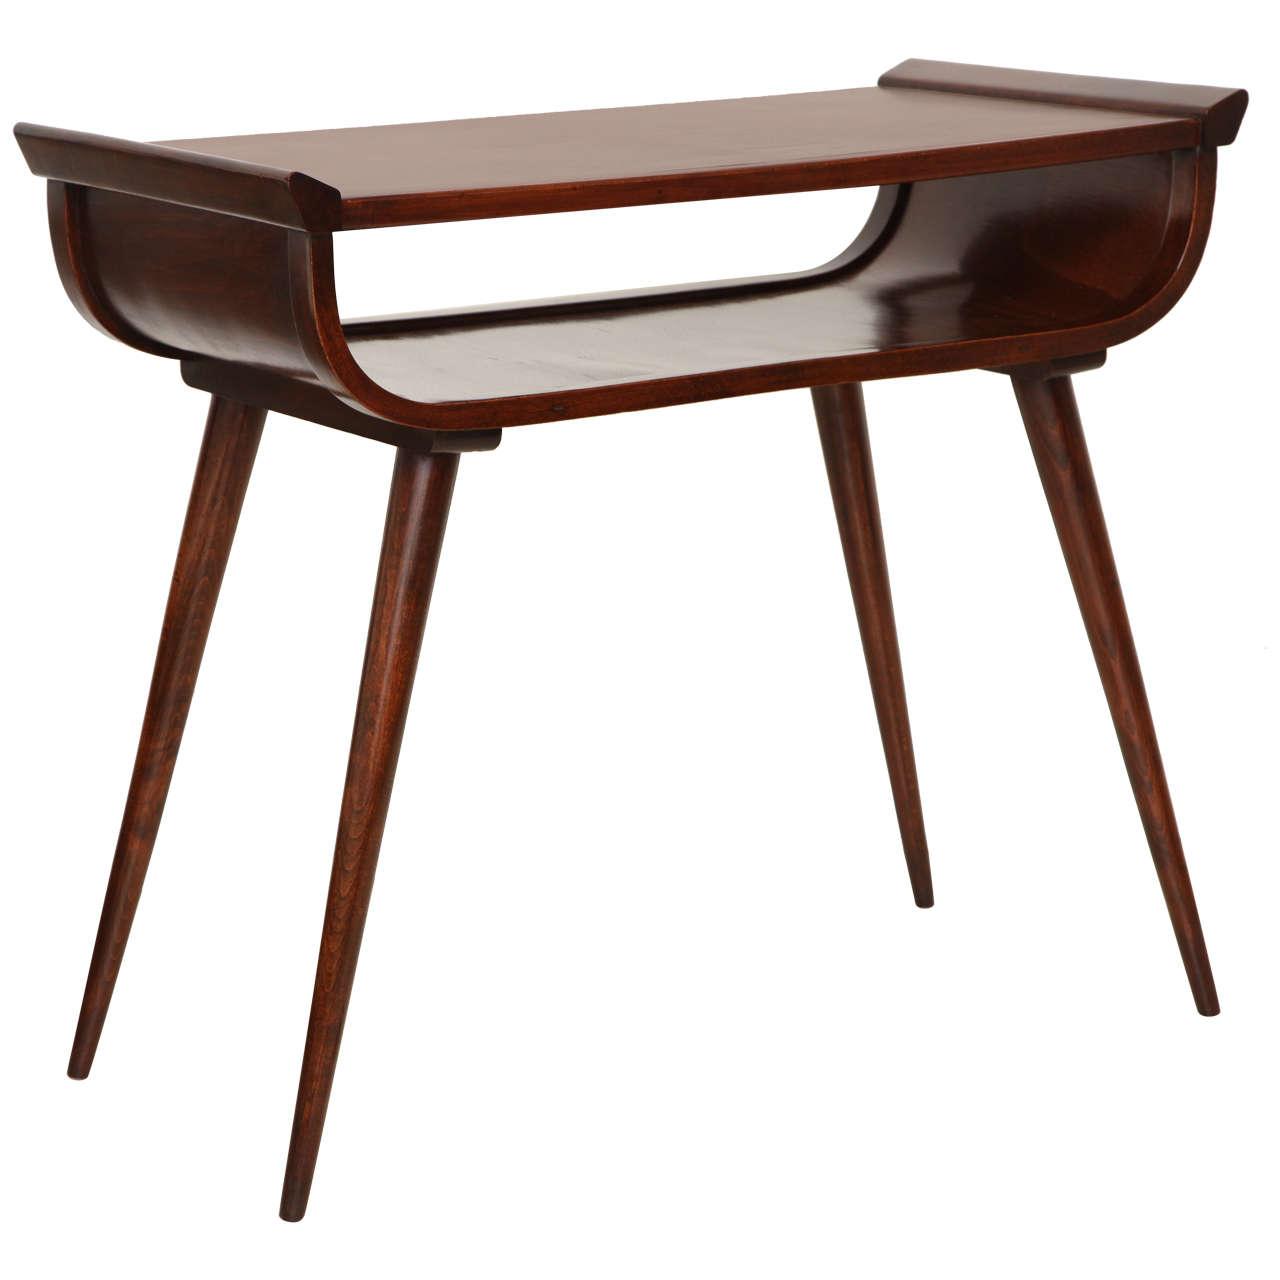 Mid Century Modern Console Table: Mid-Century Modern Walnut Console Table At 1stdibs